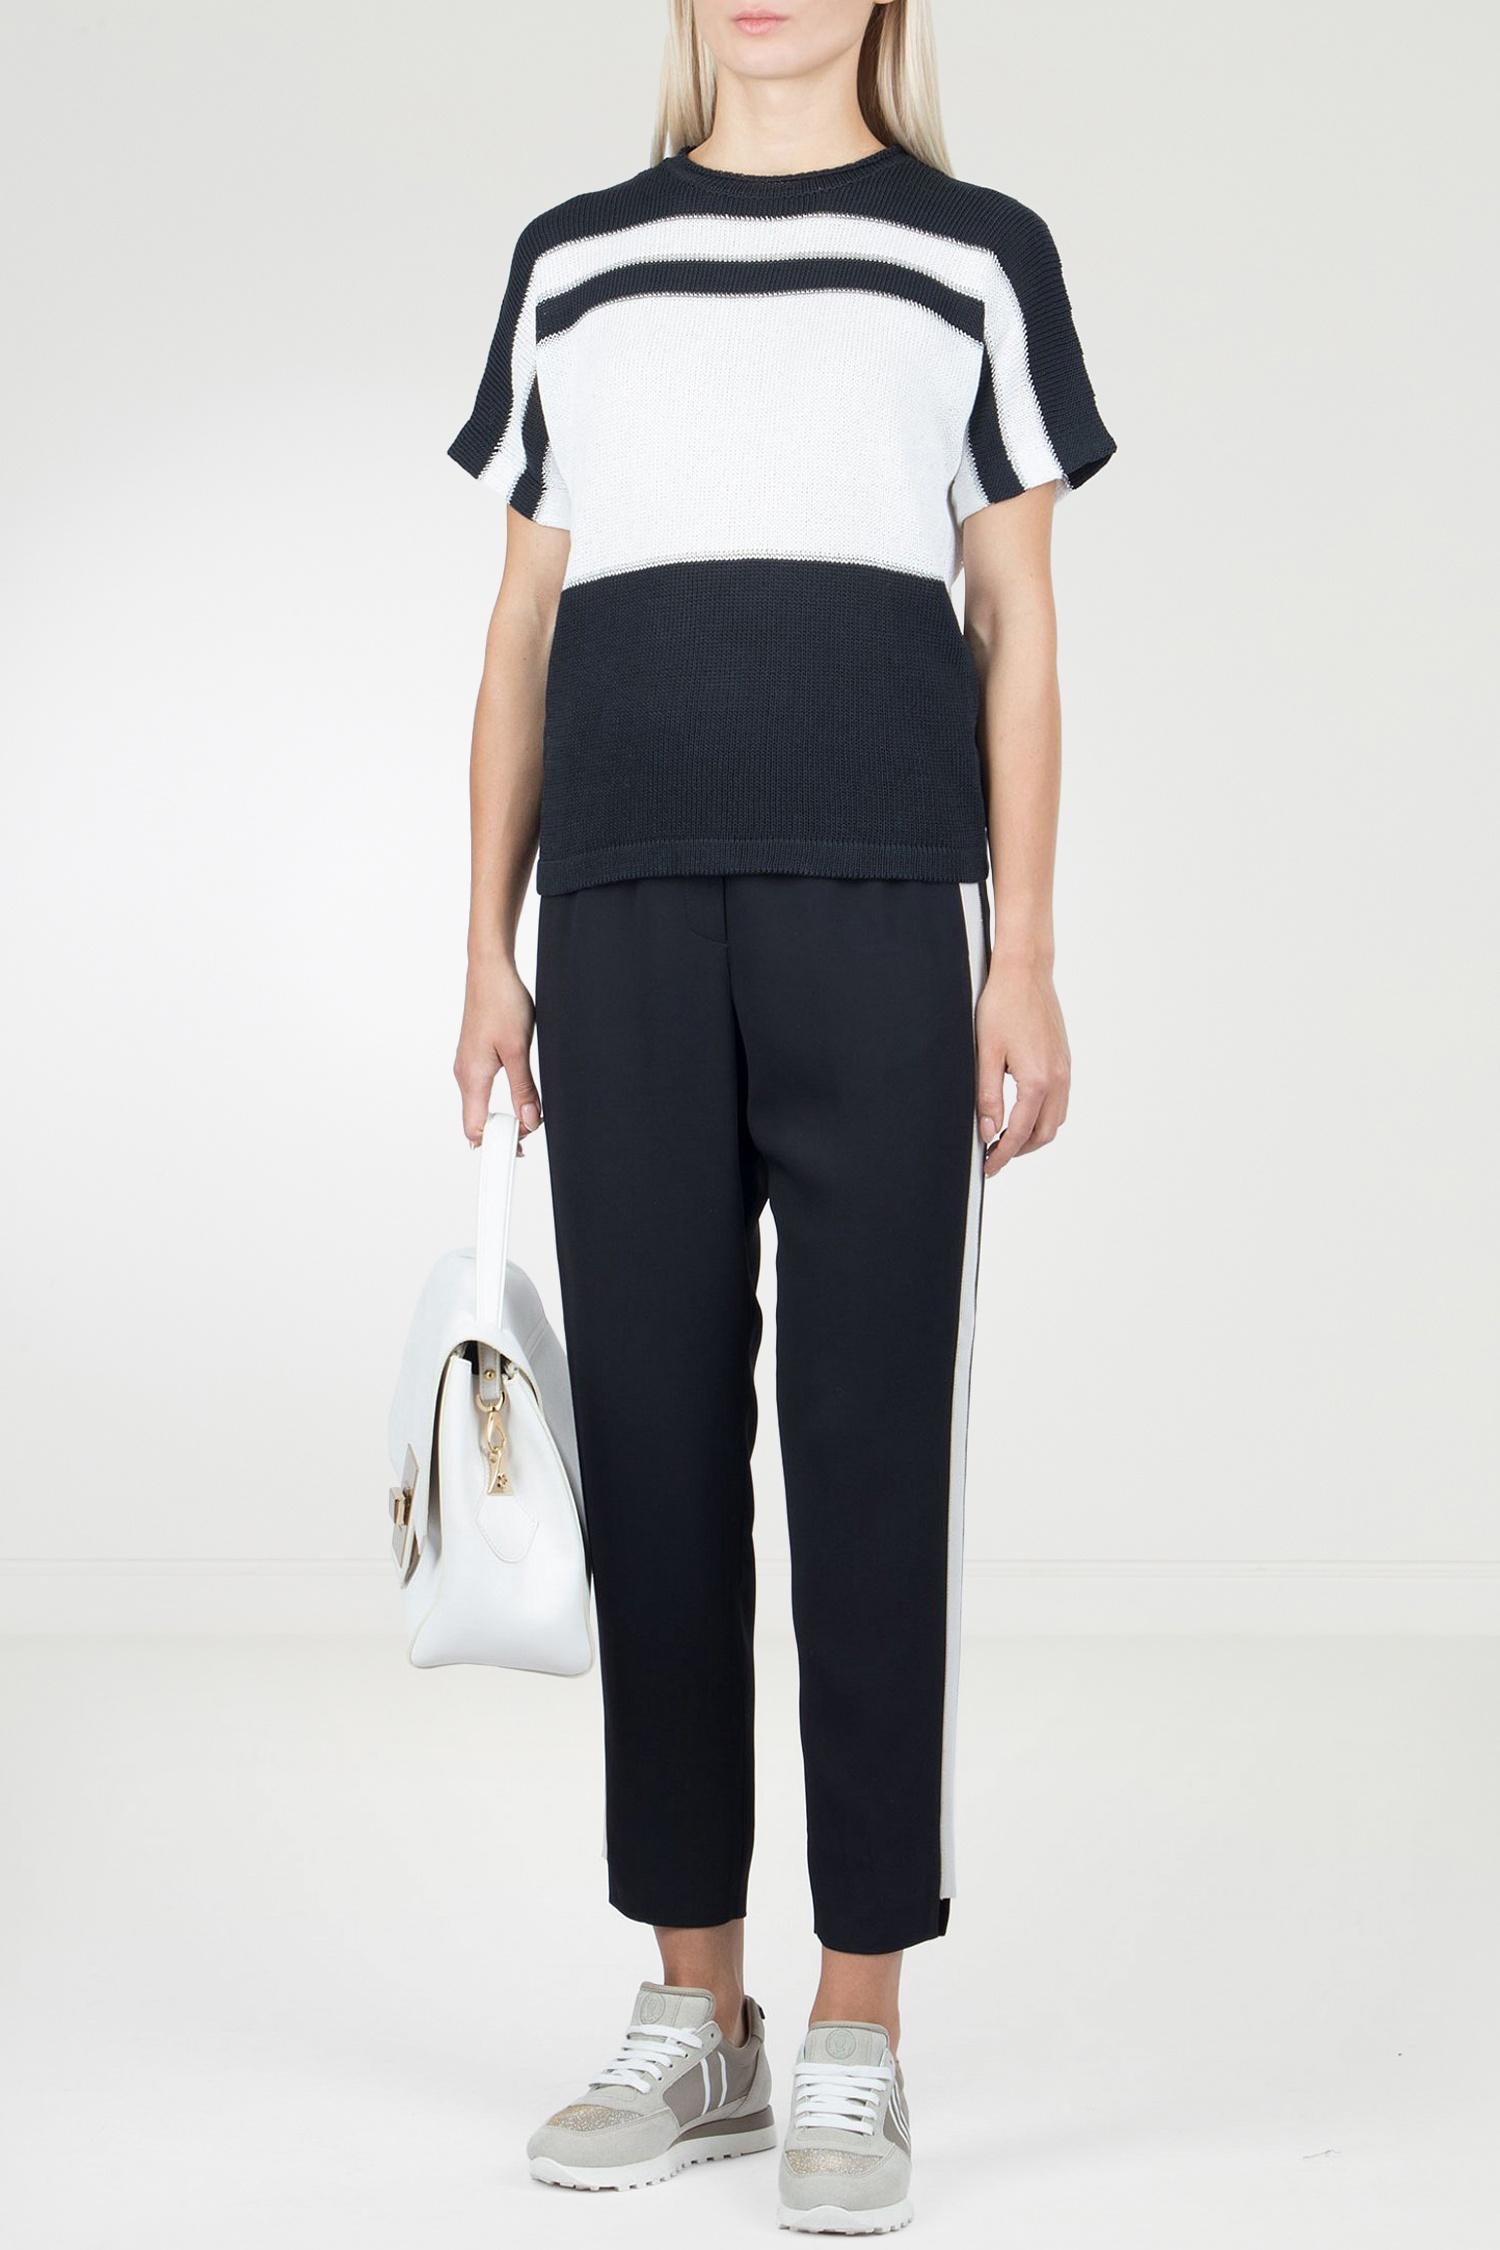 8f6e4cbc0bb0 Черные брюки с лампасами